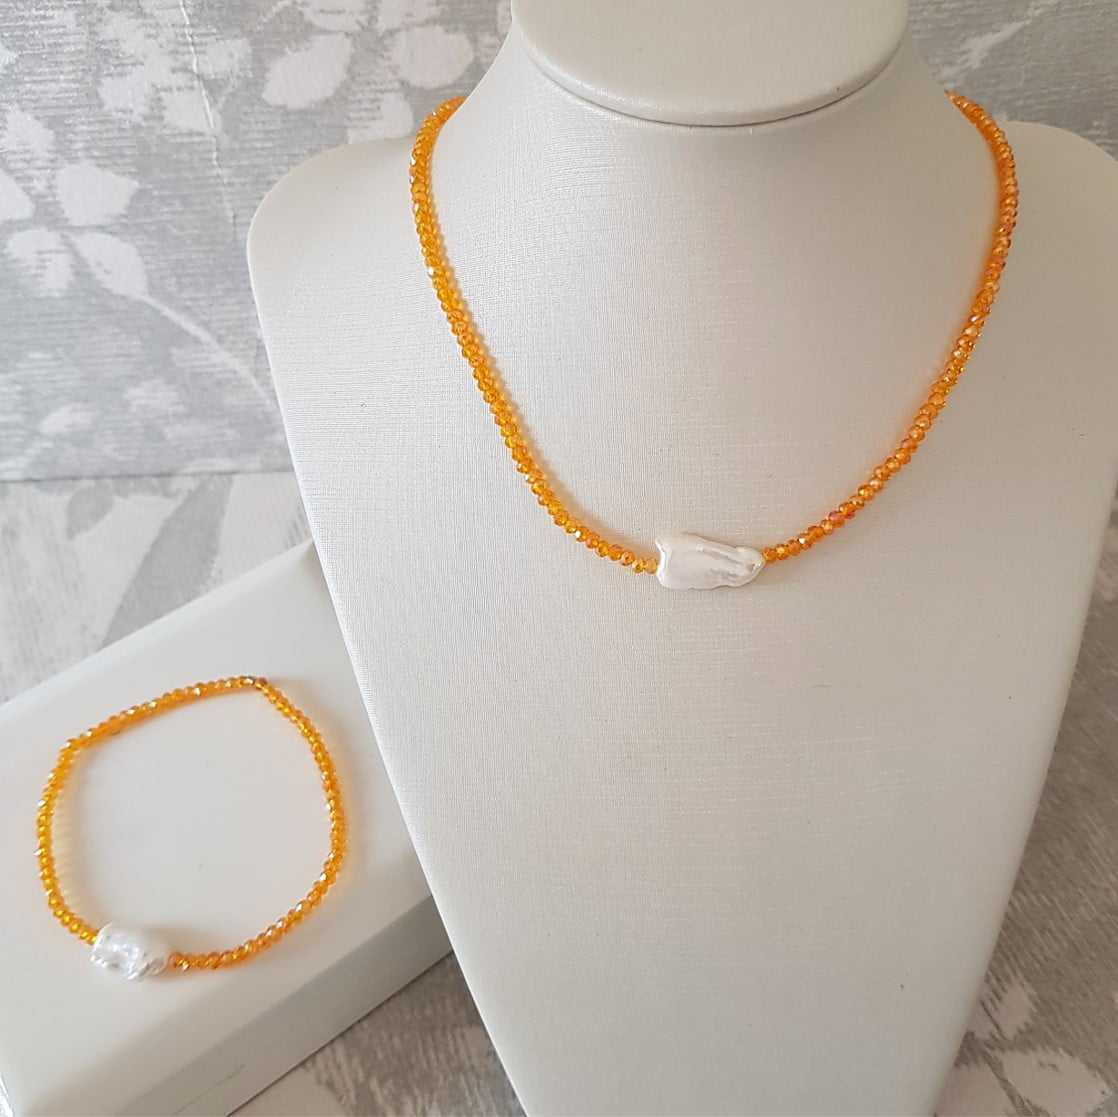 Conjunto colar curto e pulseira com cristais e pérolas